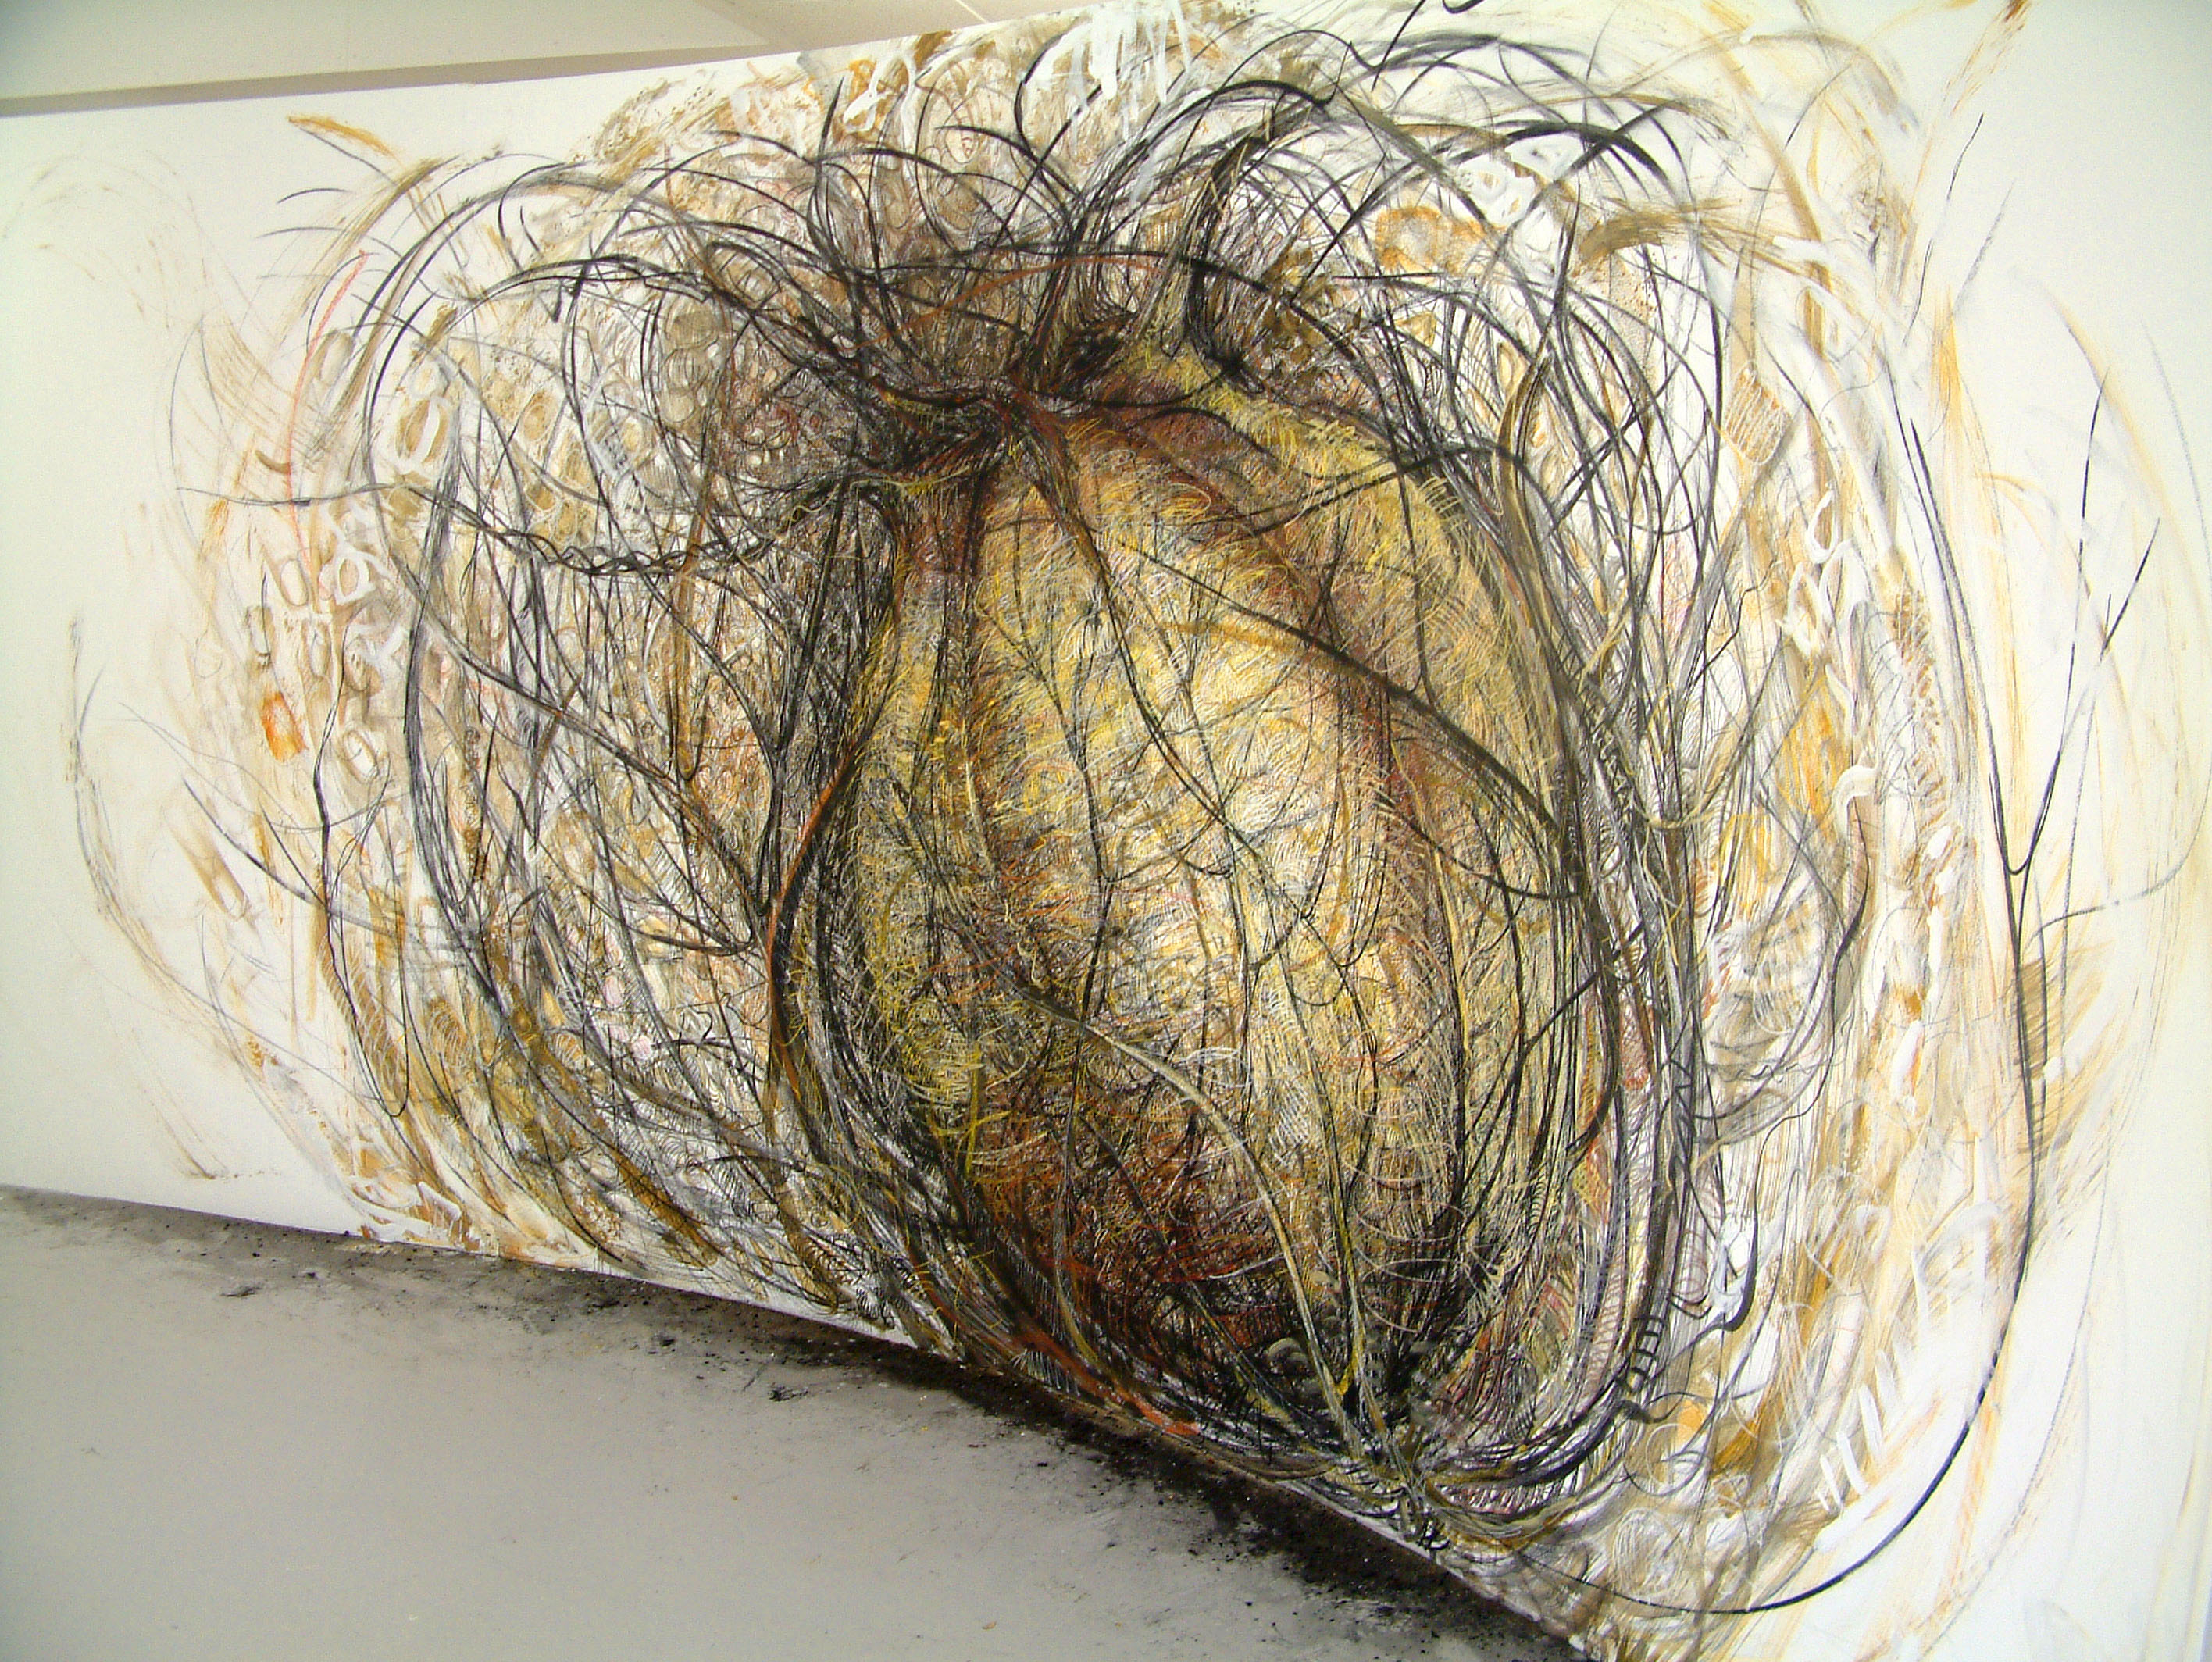 rohini-devasher-copyright-seed-wall-drawing-2004 (2)